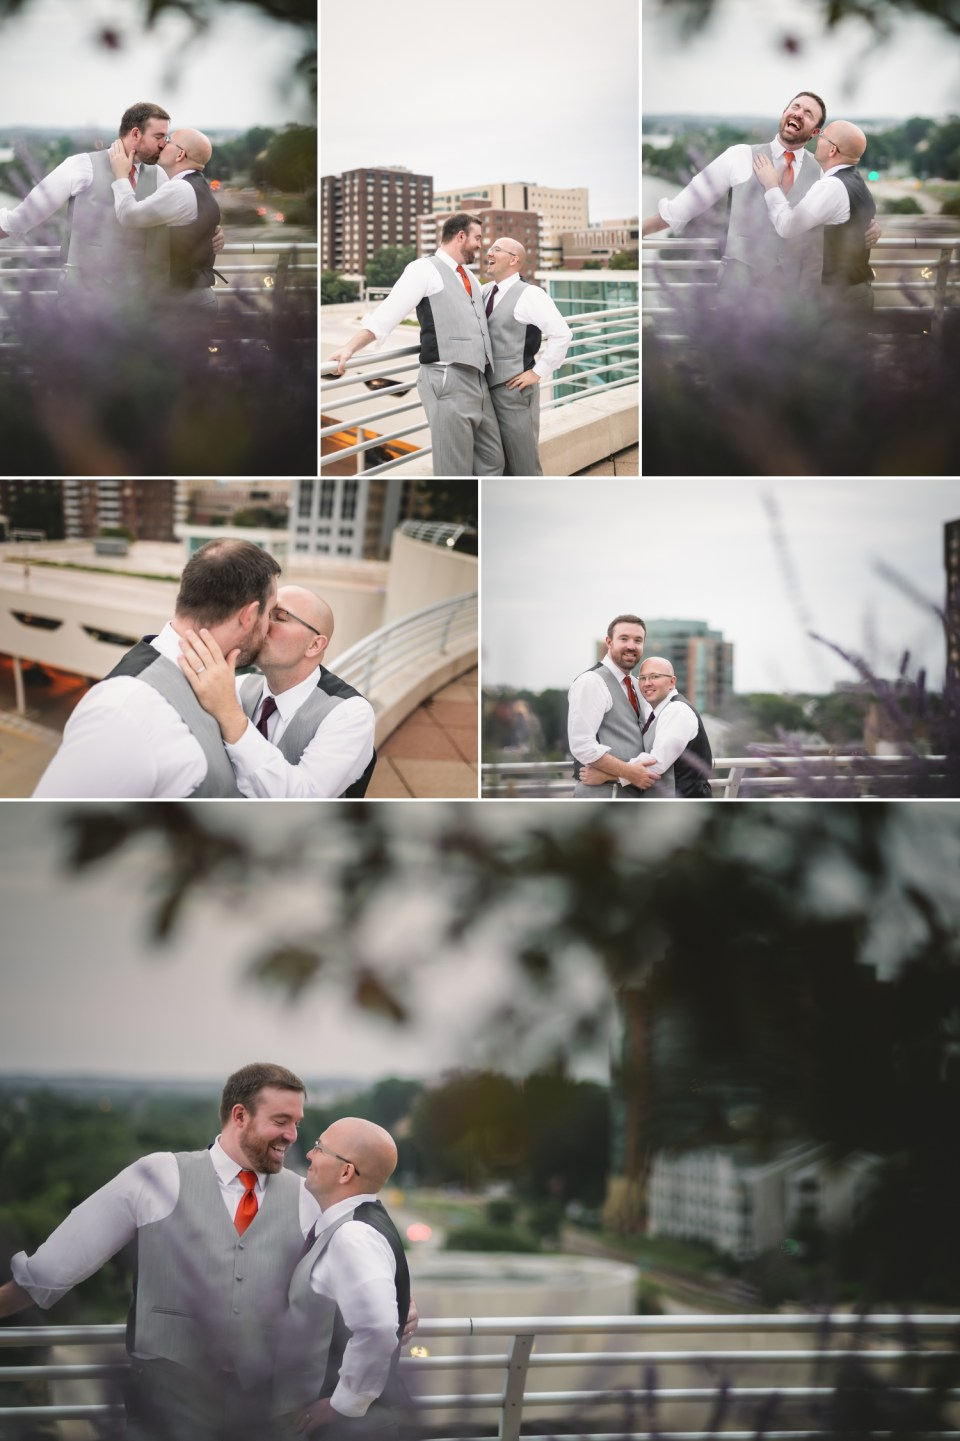 Sunset LGBTQ Wedding Photos | Pink Spruce Photography | www.pinksprucephotography.com